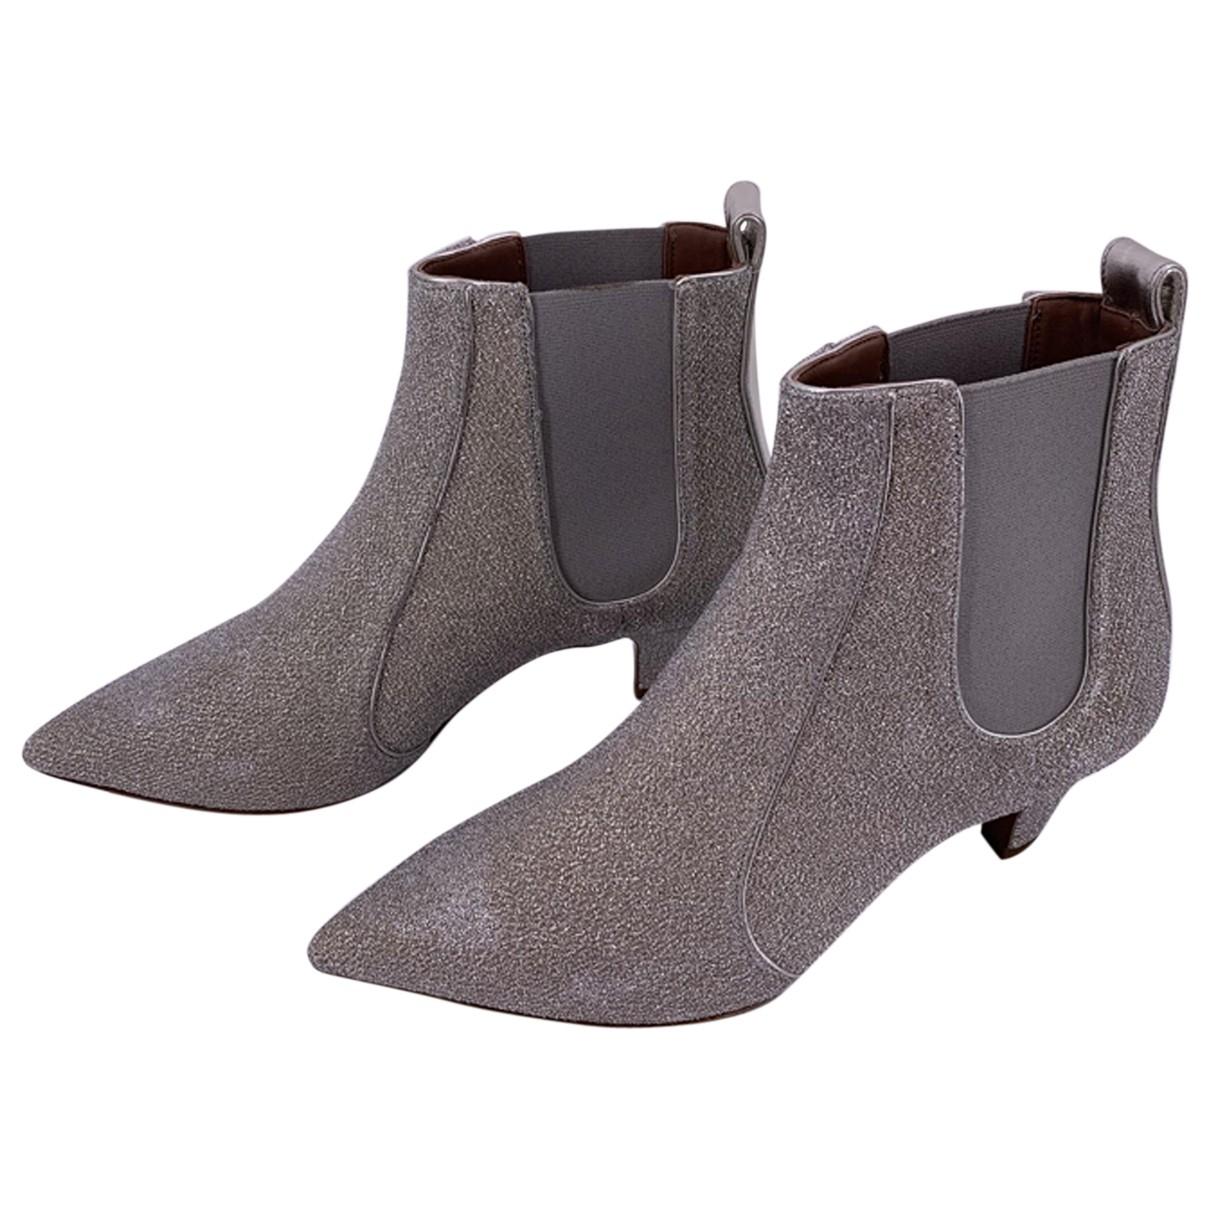 Tabitha Simmons \N Grey Glitter Ankle boots for Women 37.5 EU